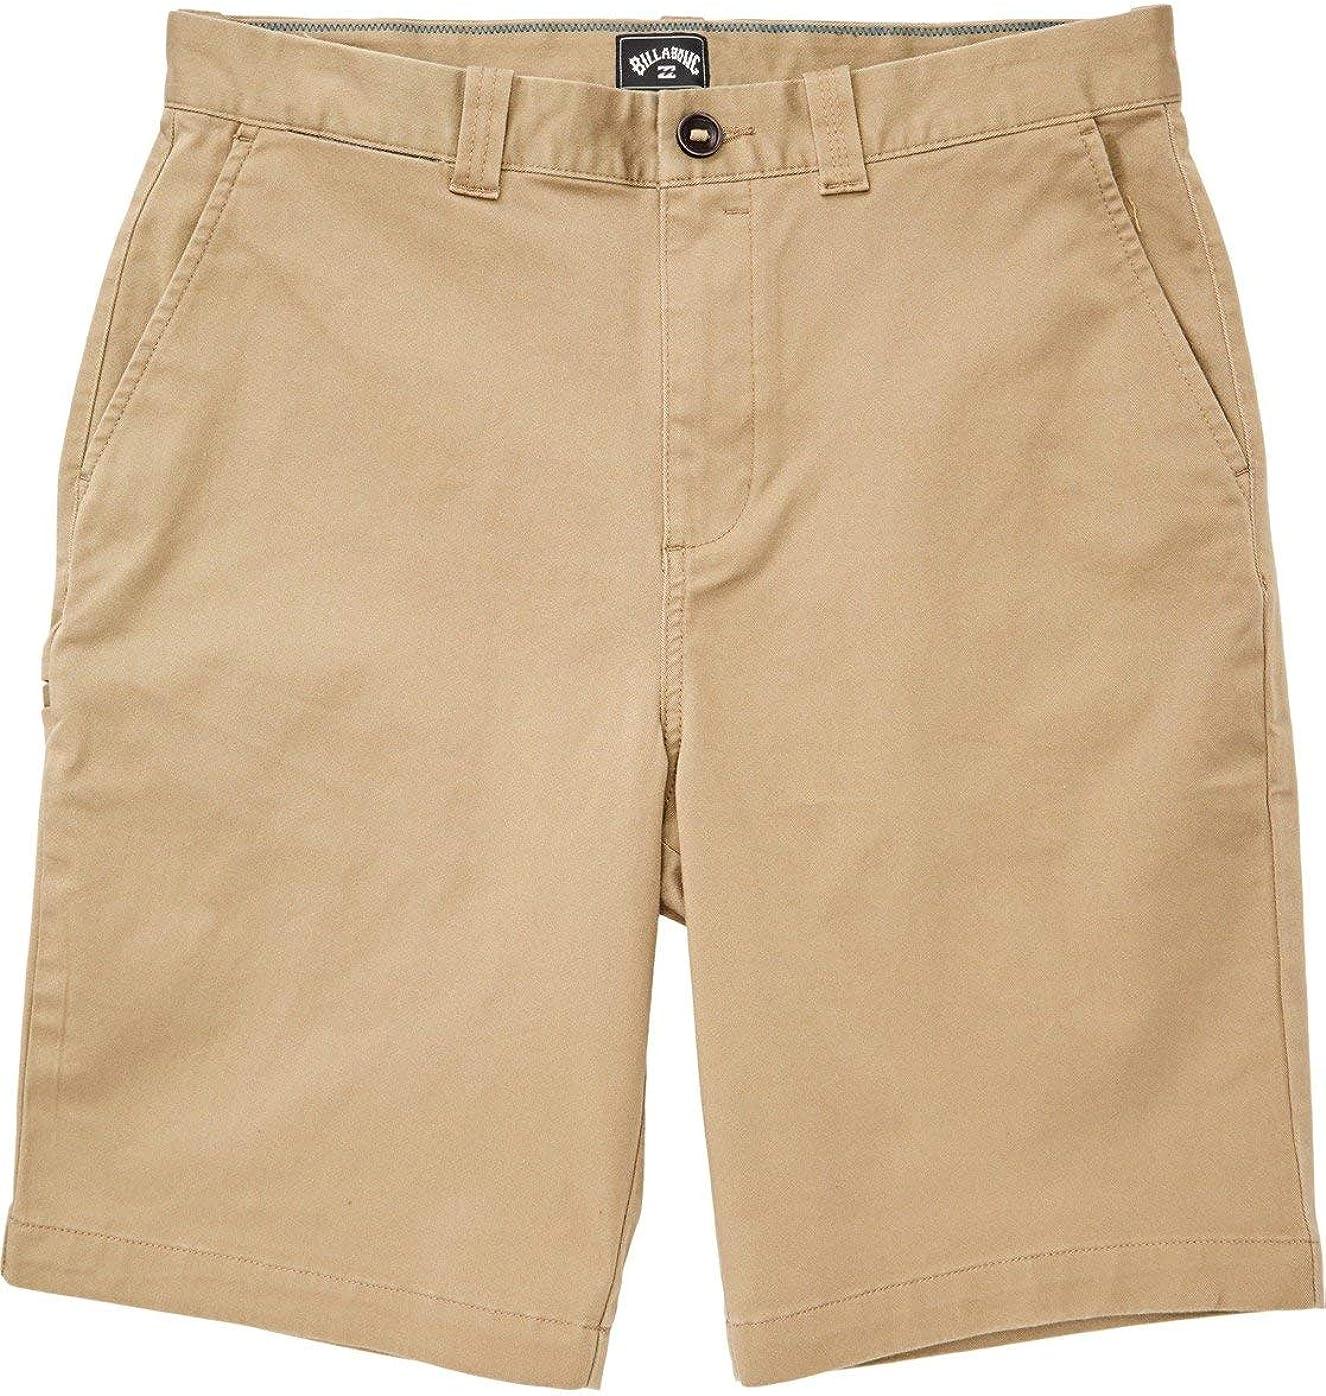 BILLABONG Carter - Shorts Hombre